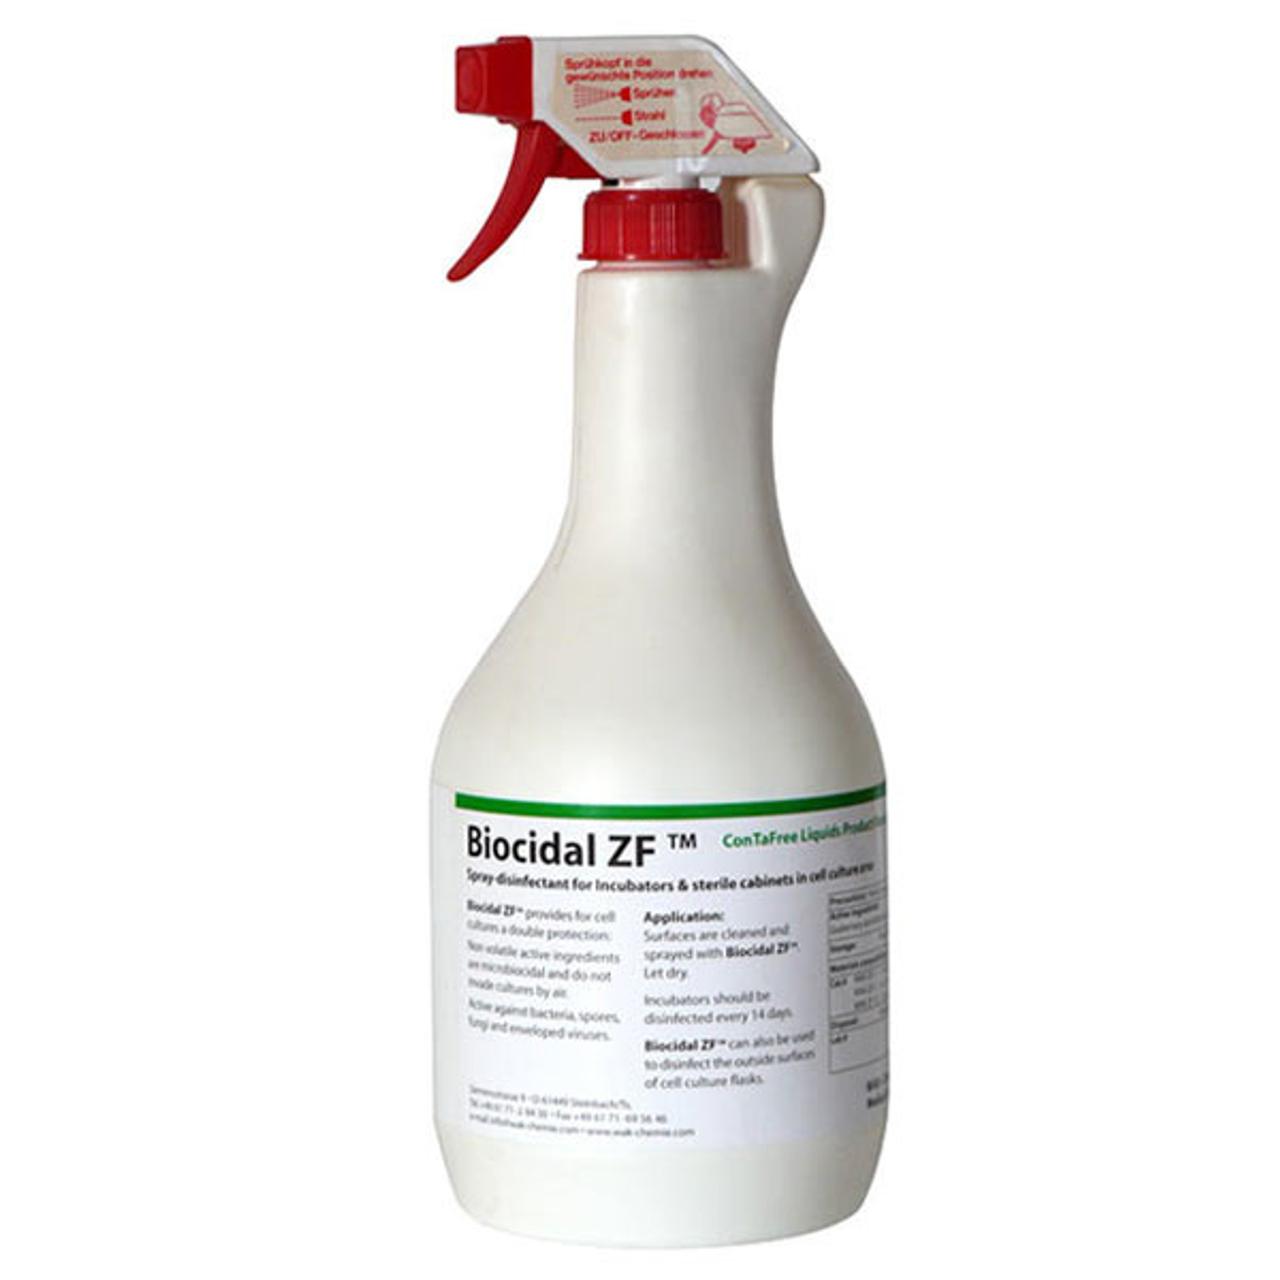 biocidal-zf